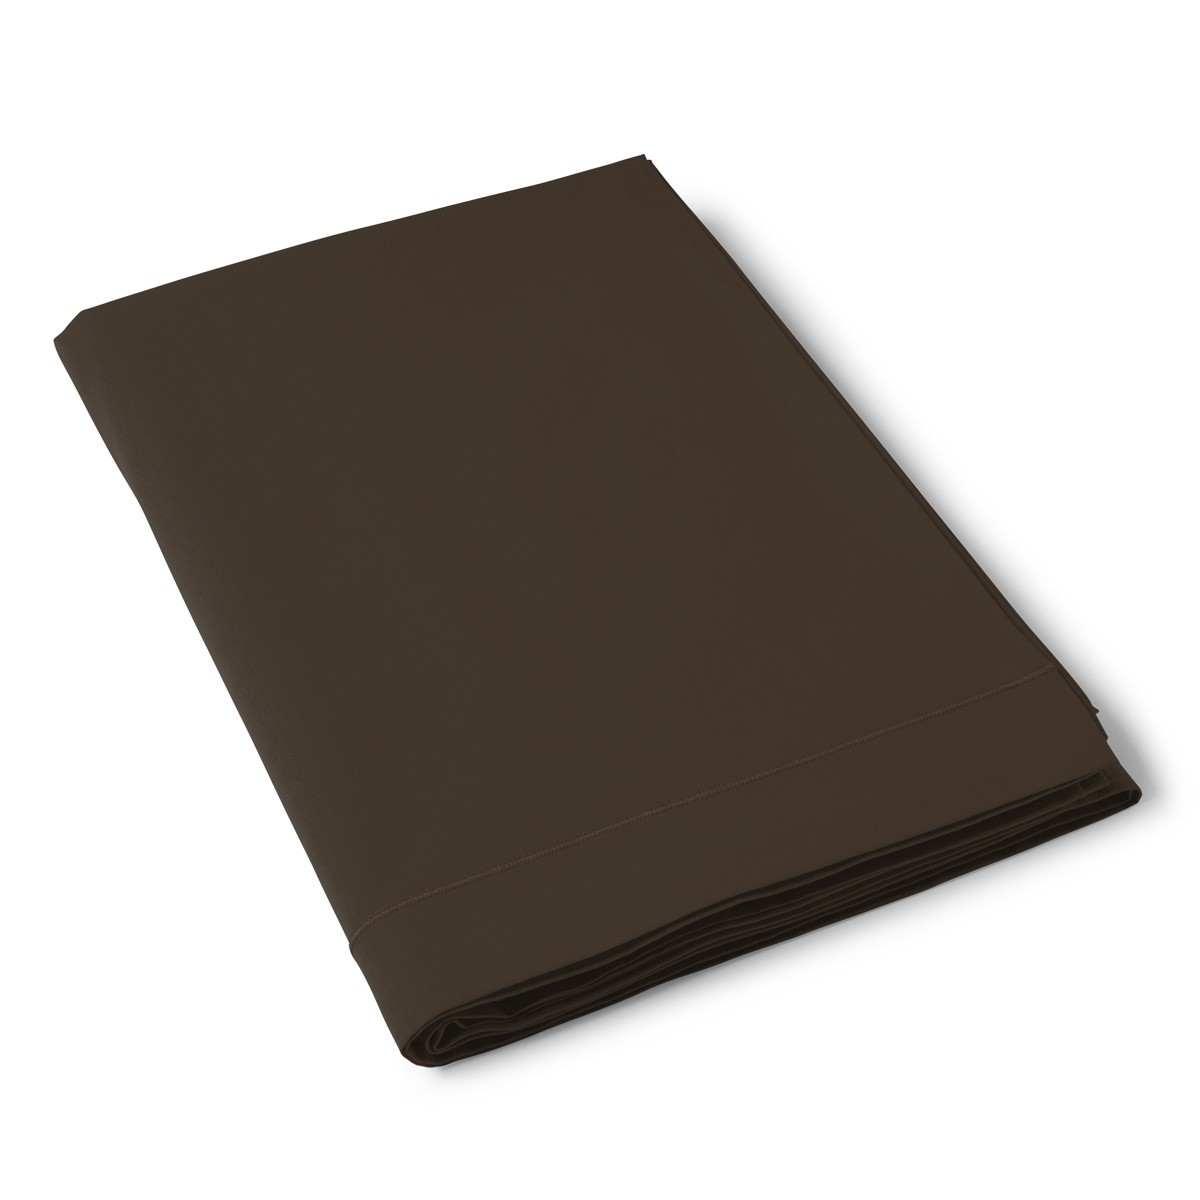 Flat Sheet Solid Color Cotton brown | Bed linen | Tradition des Vosges